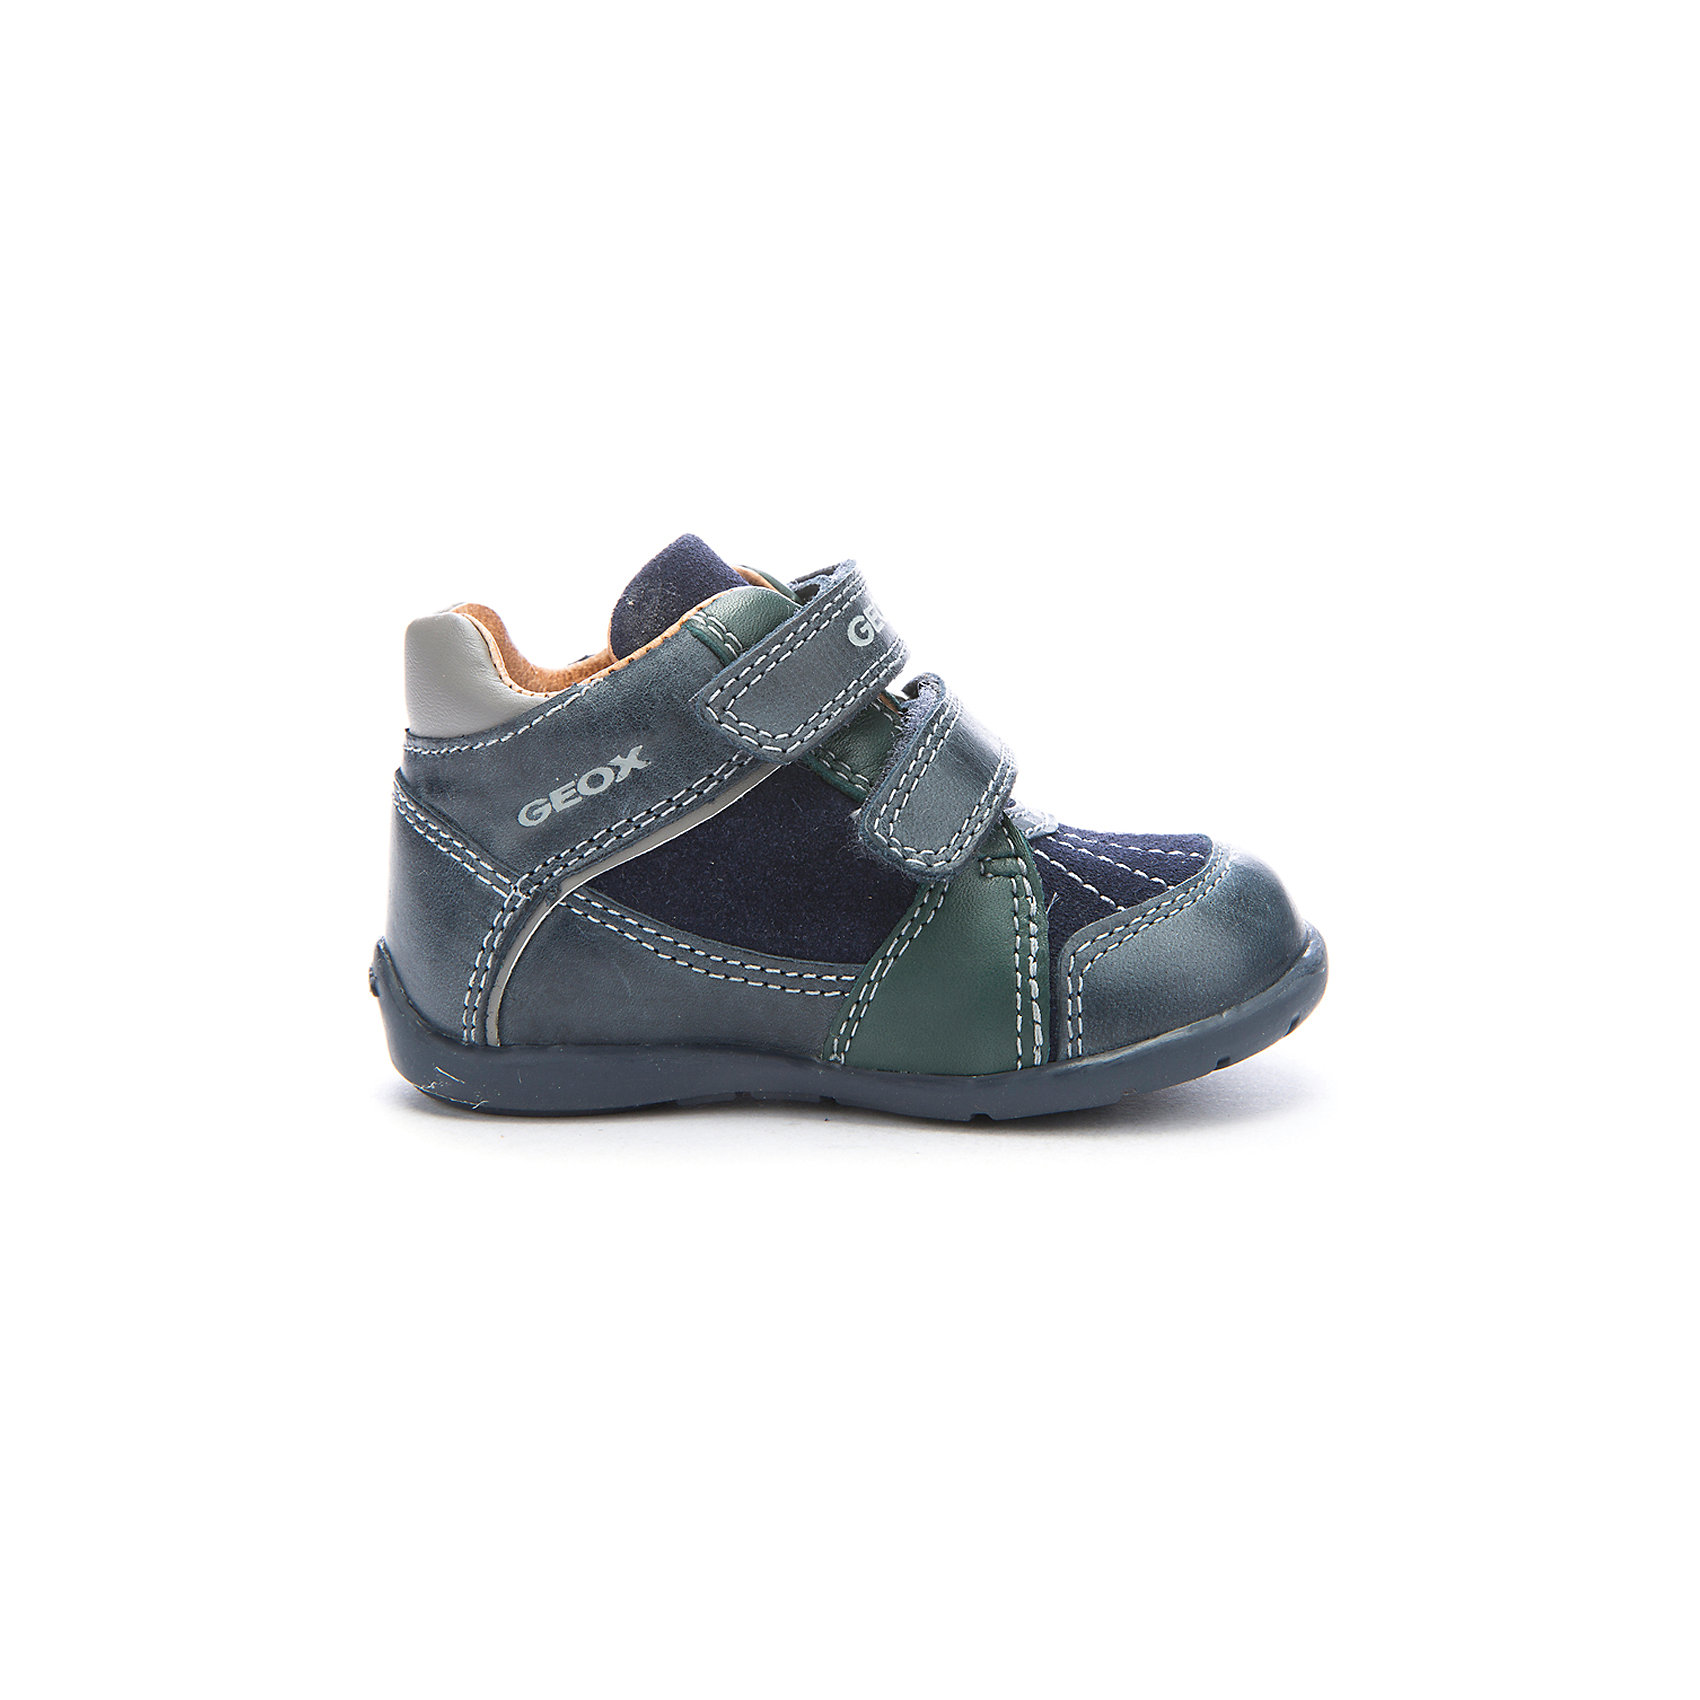 GEOX Ботинки для мальчика GEOX geox ботинки для мальчика geox